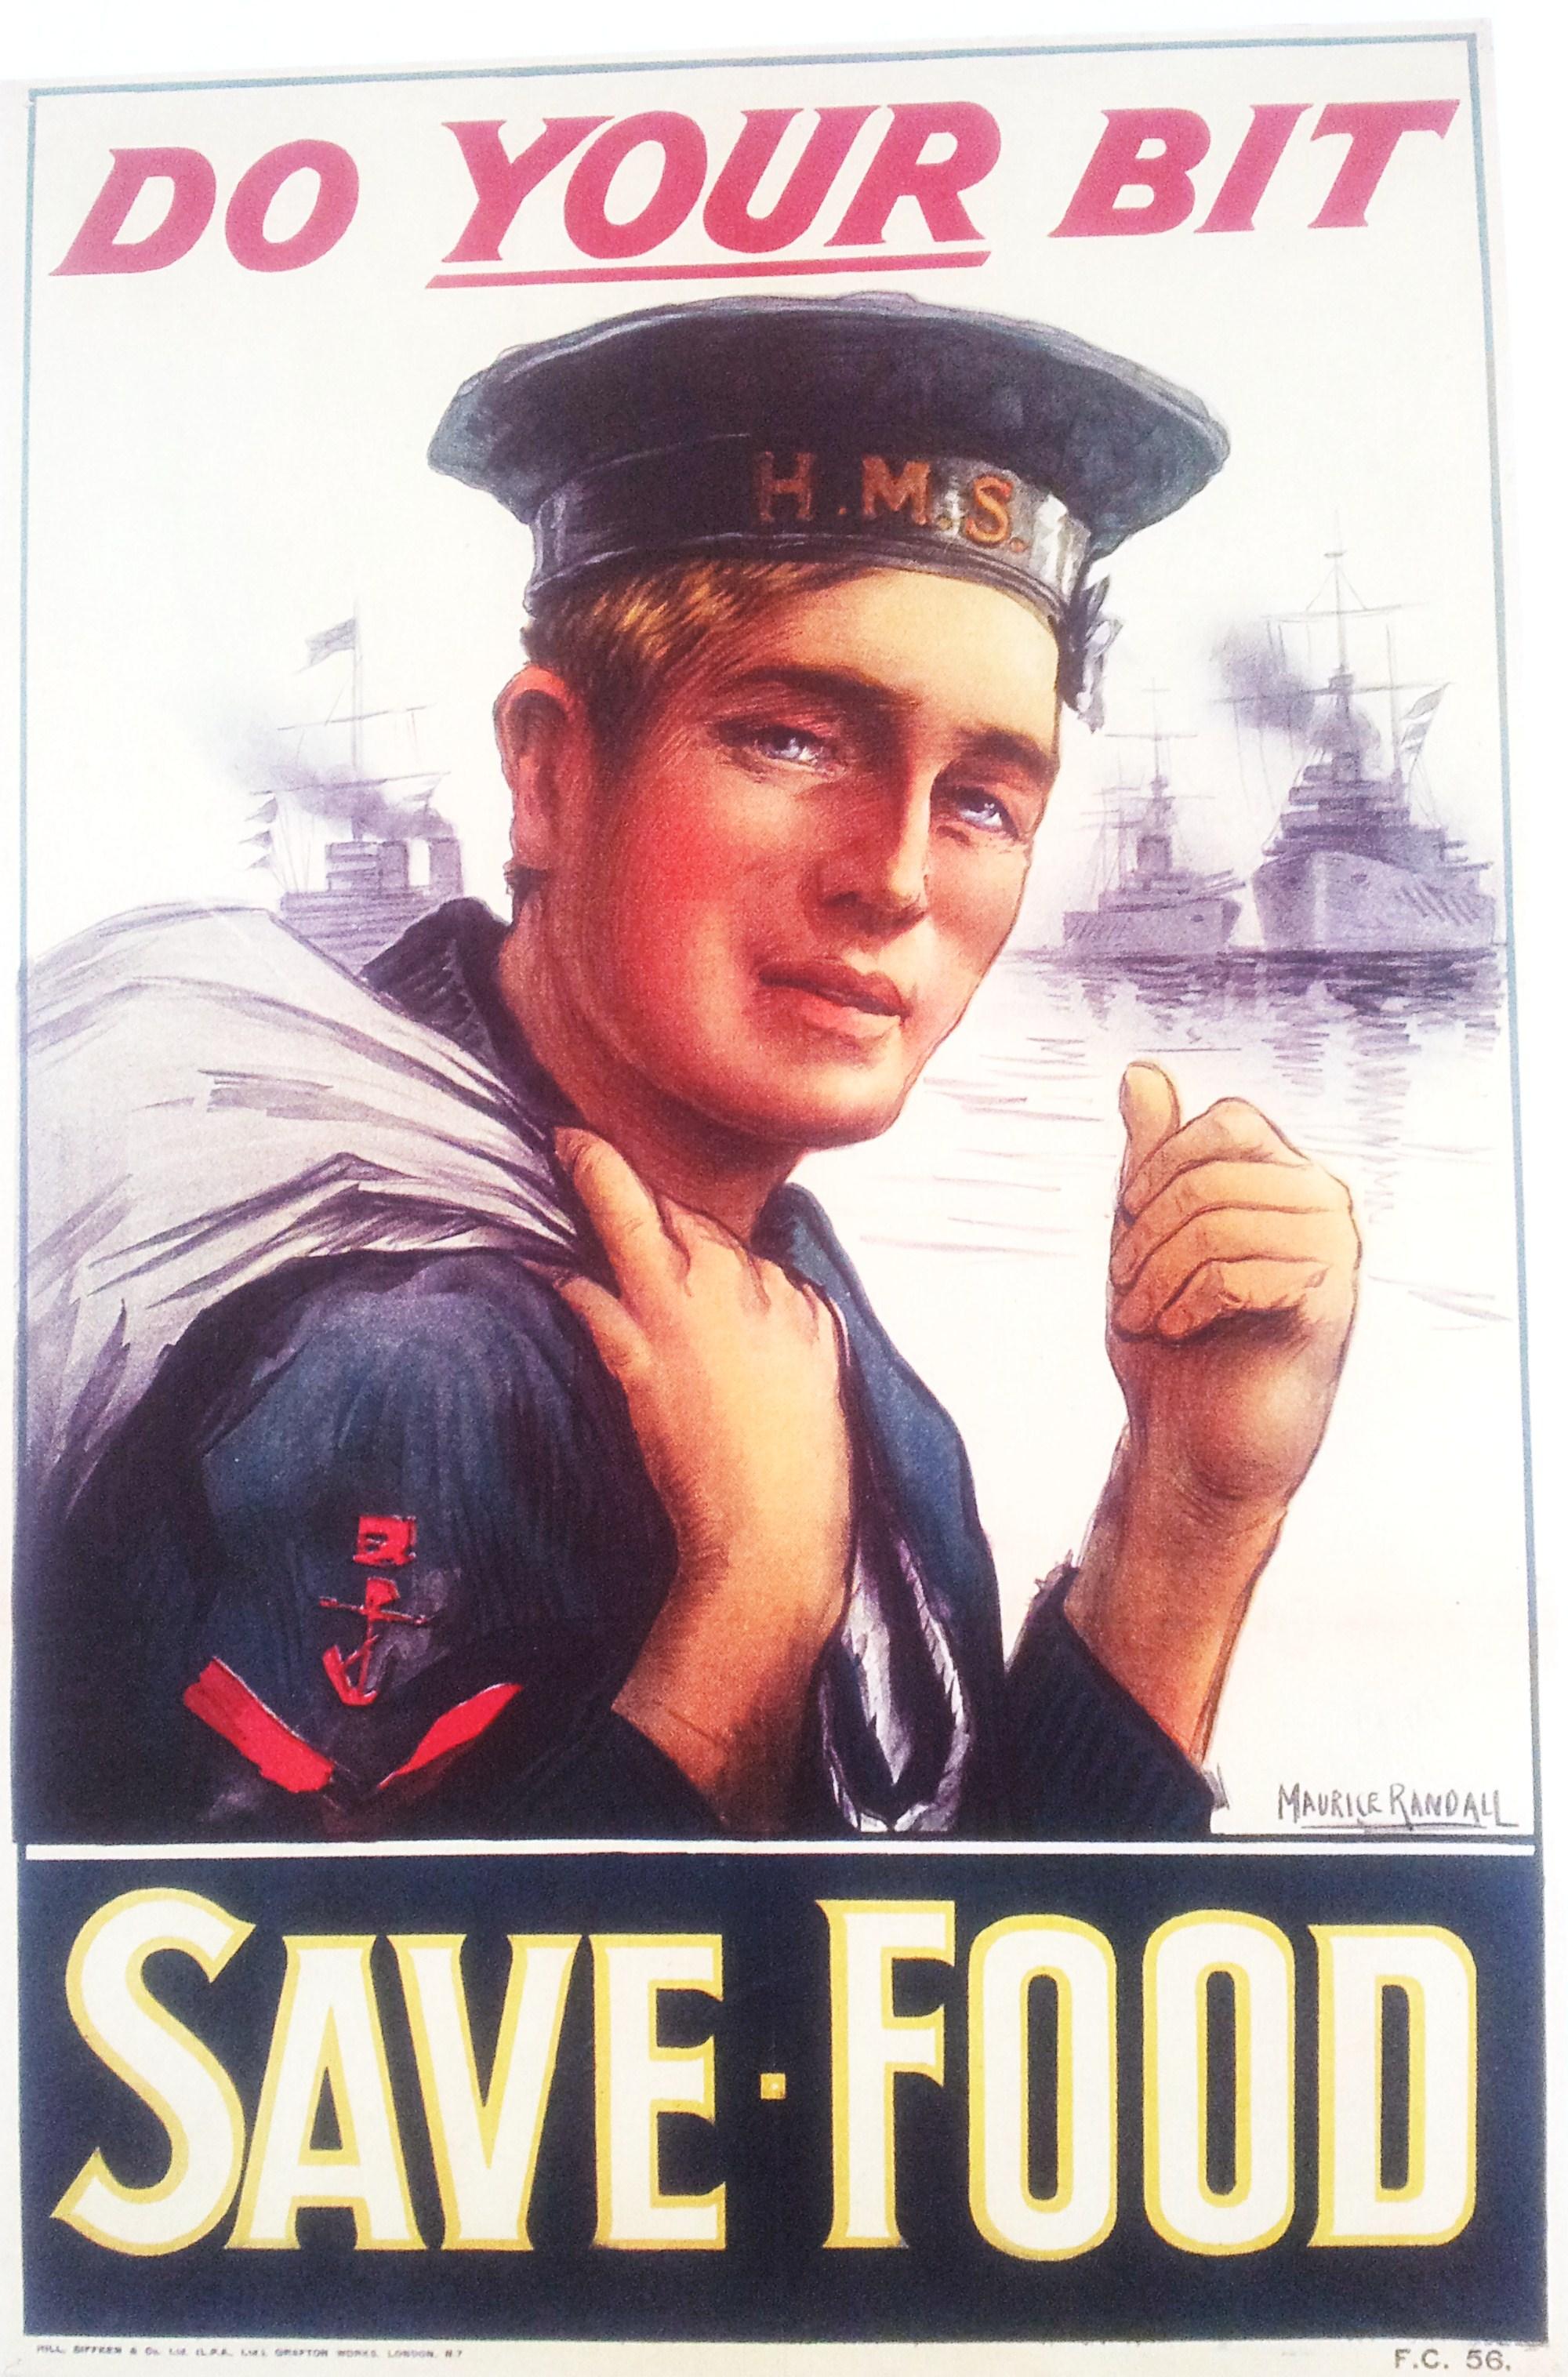 Save Food vintage poster